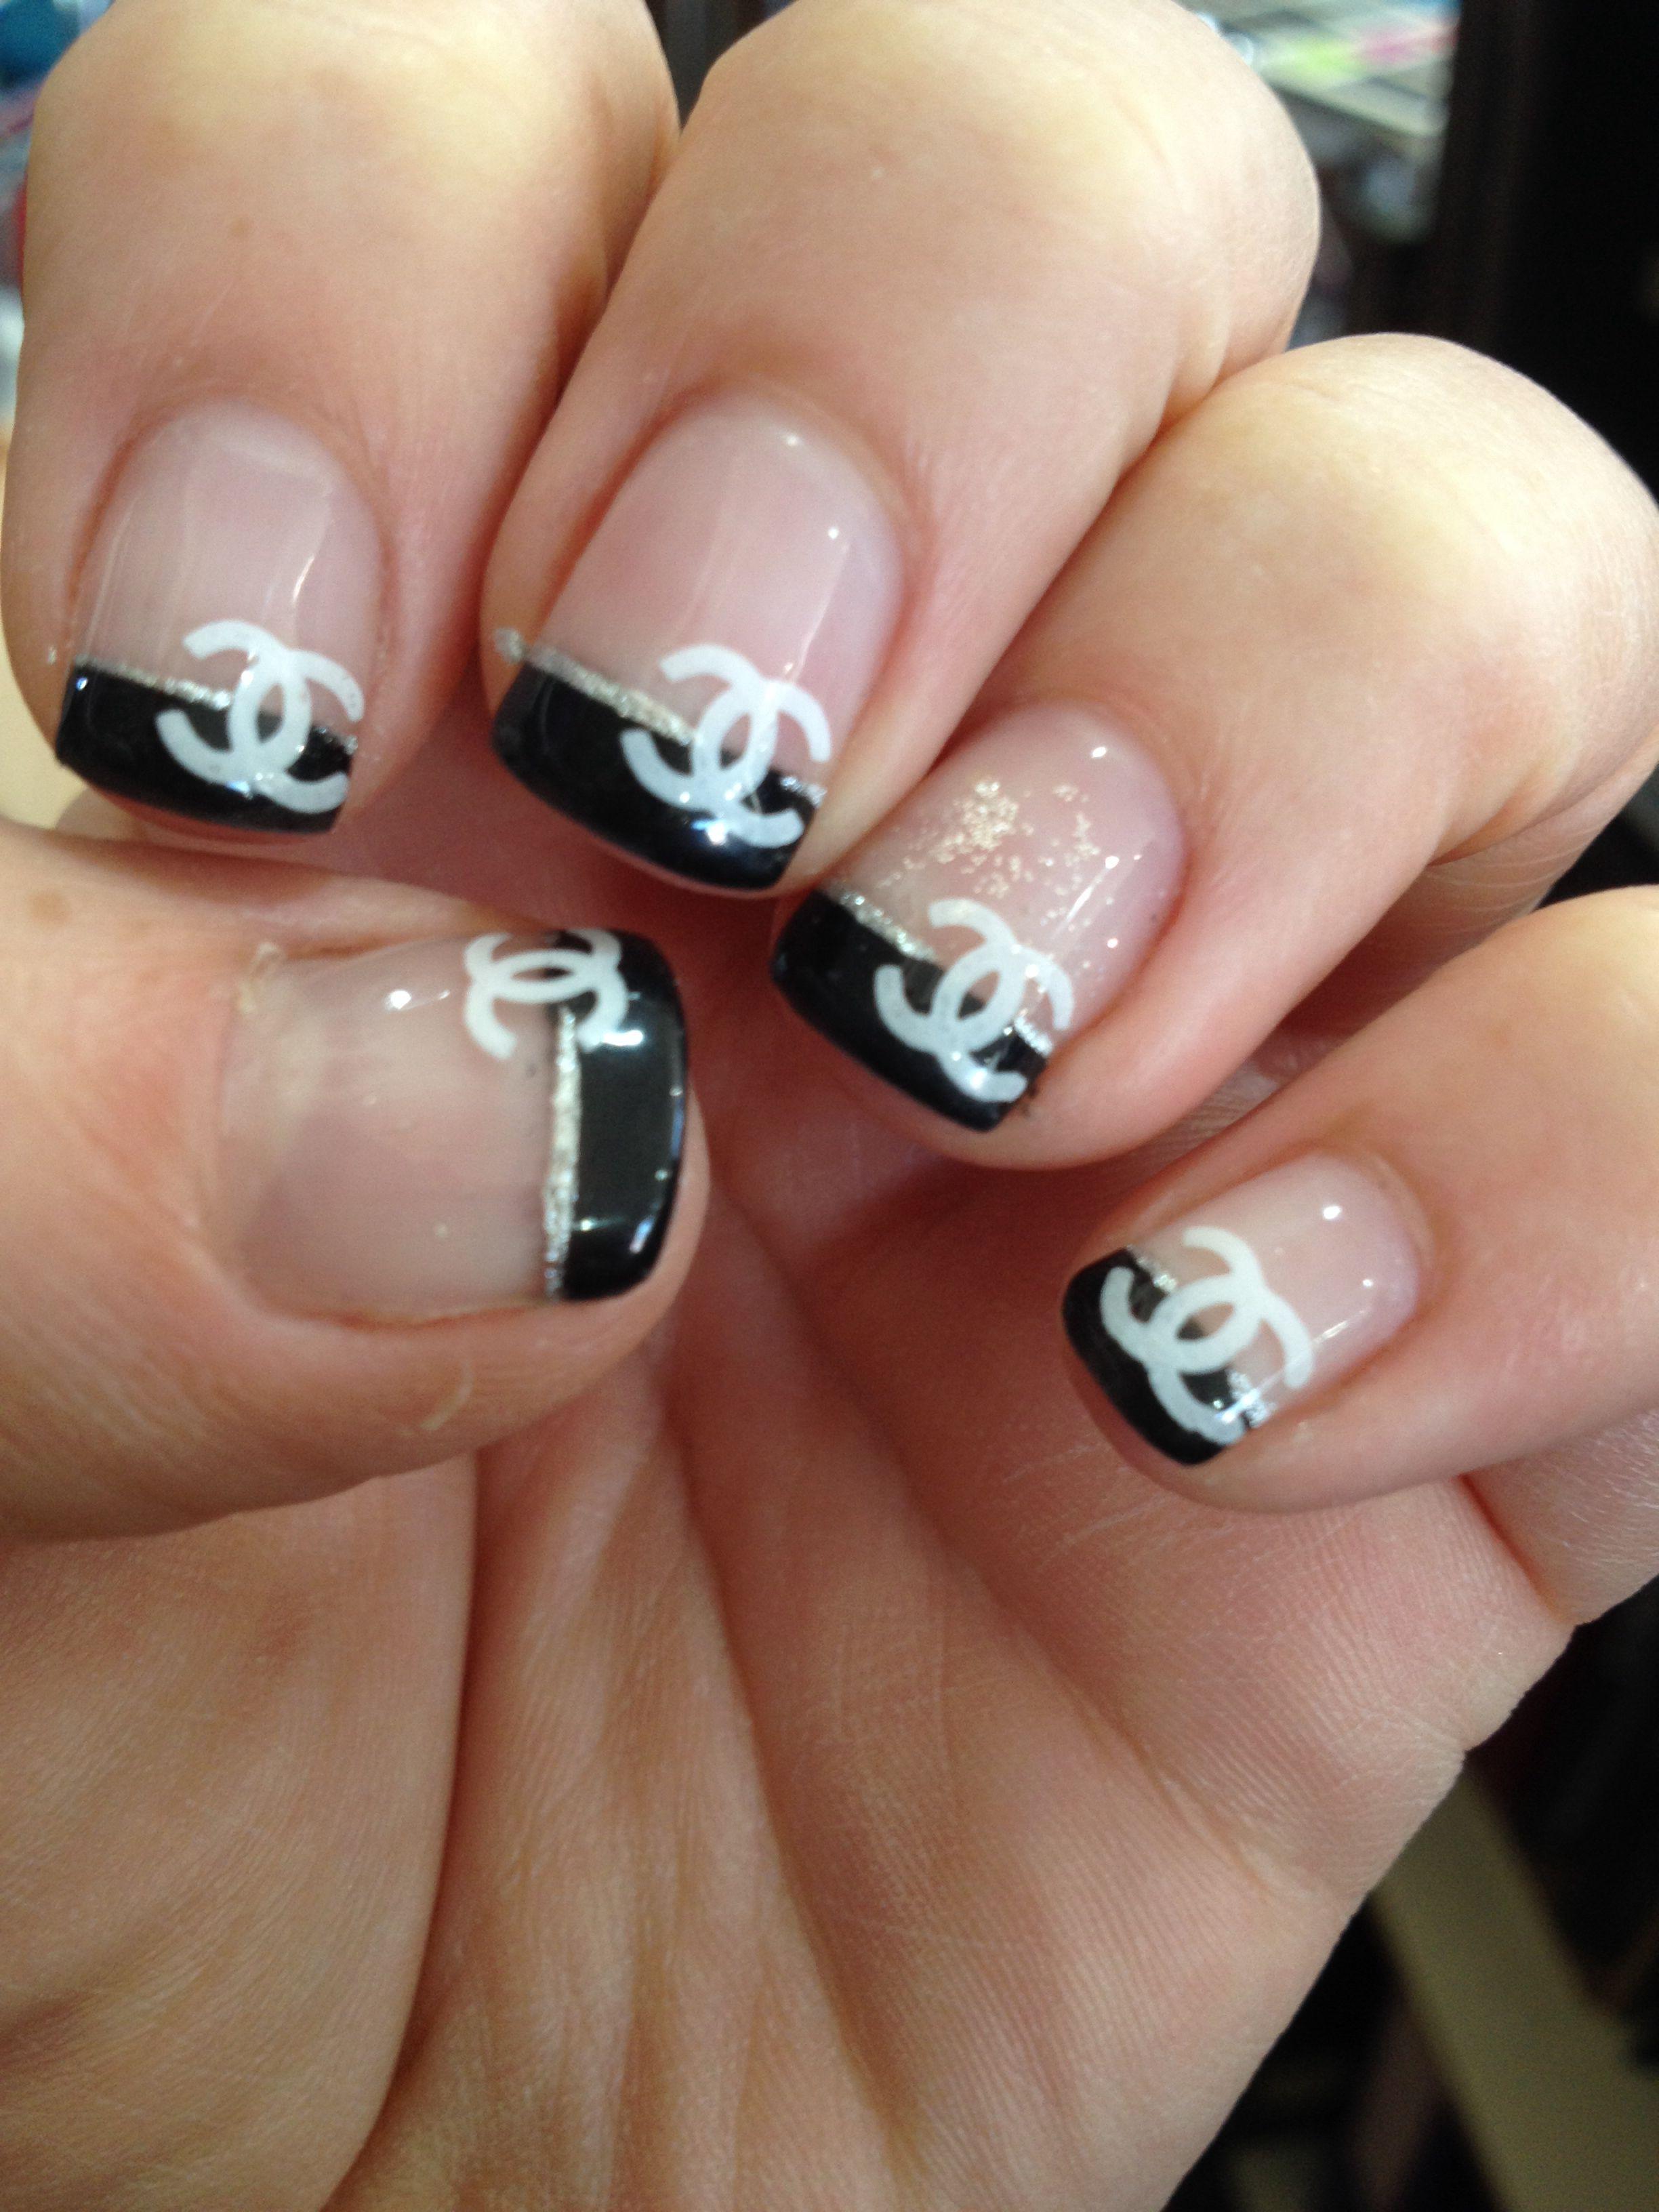 ongle Chanel   Ongles chanel, Ongles, Idee ongles